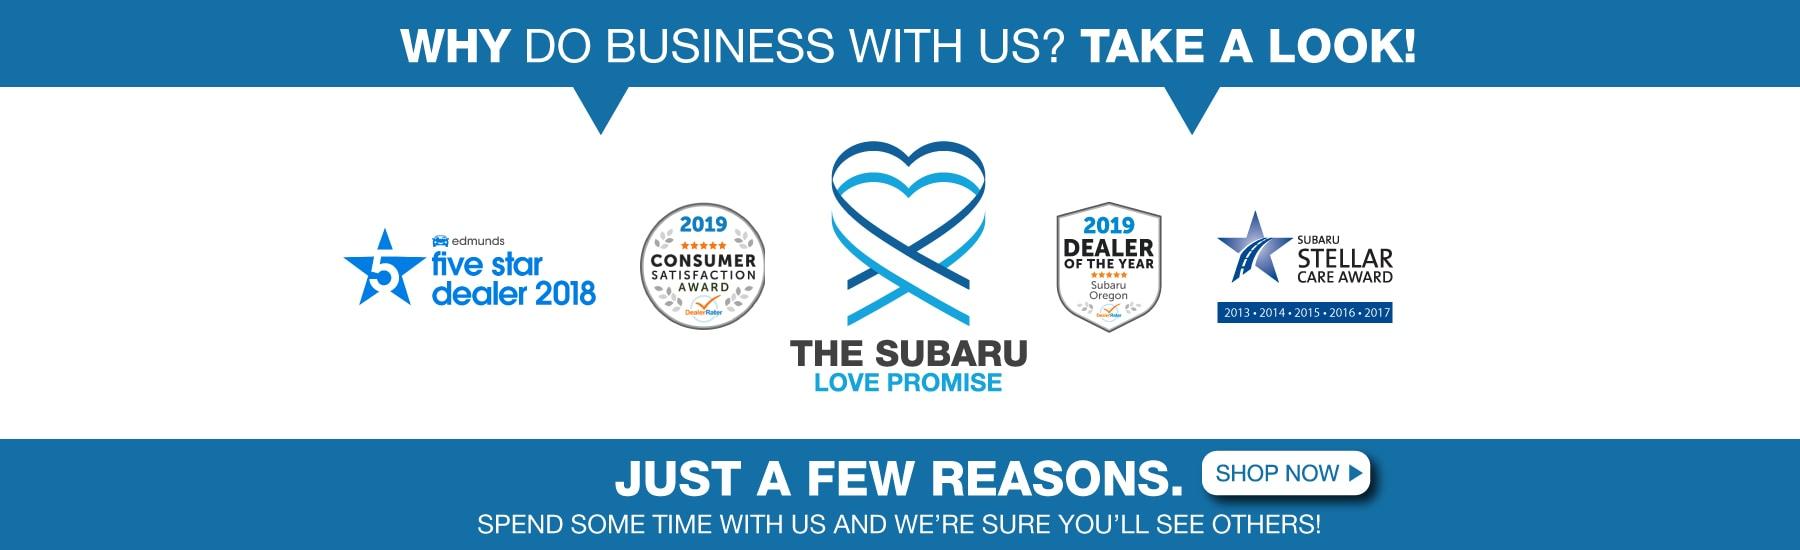 New & Used Subaru Dealership | Lithia Subaru of Oregon City Serving